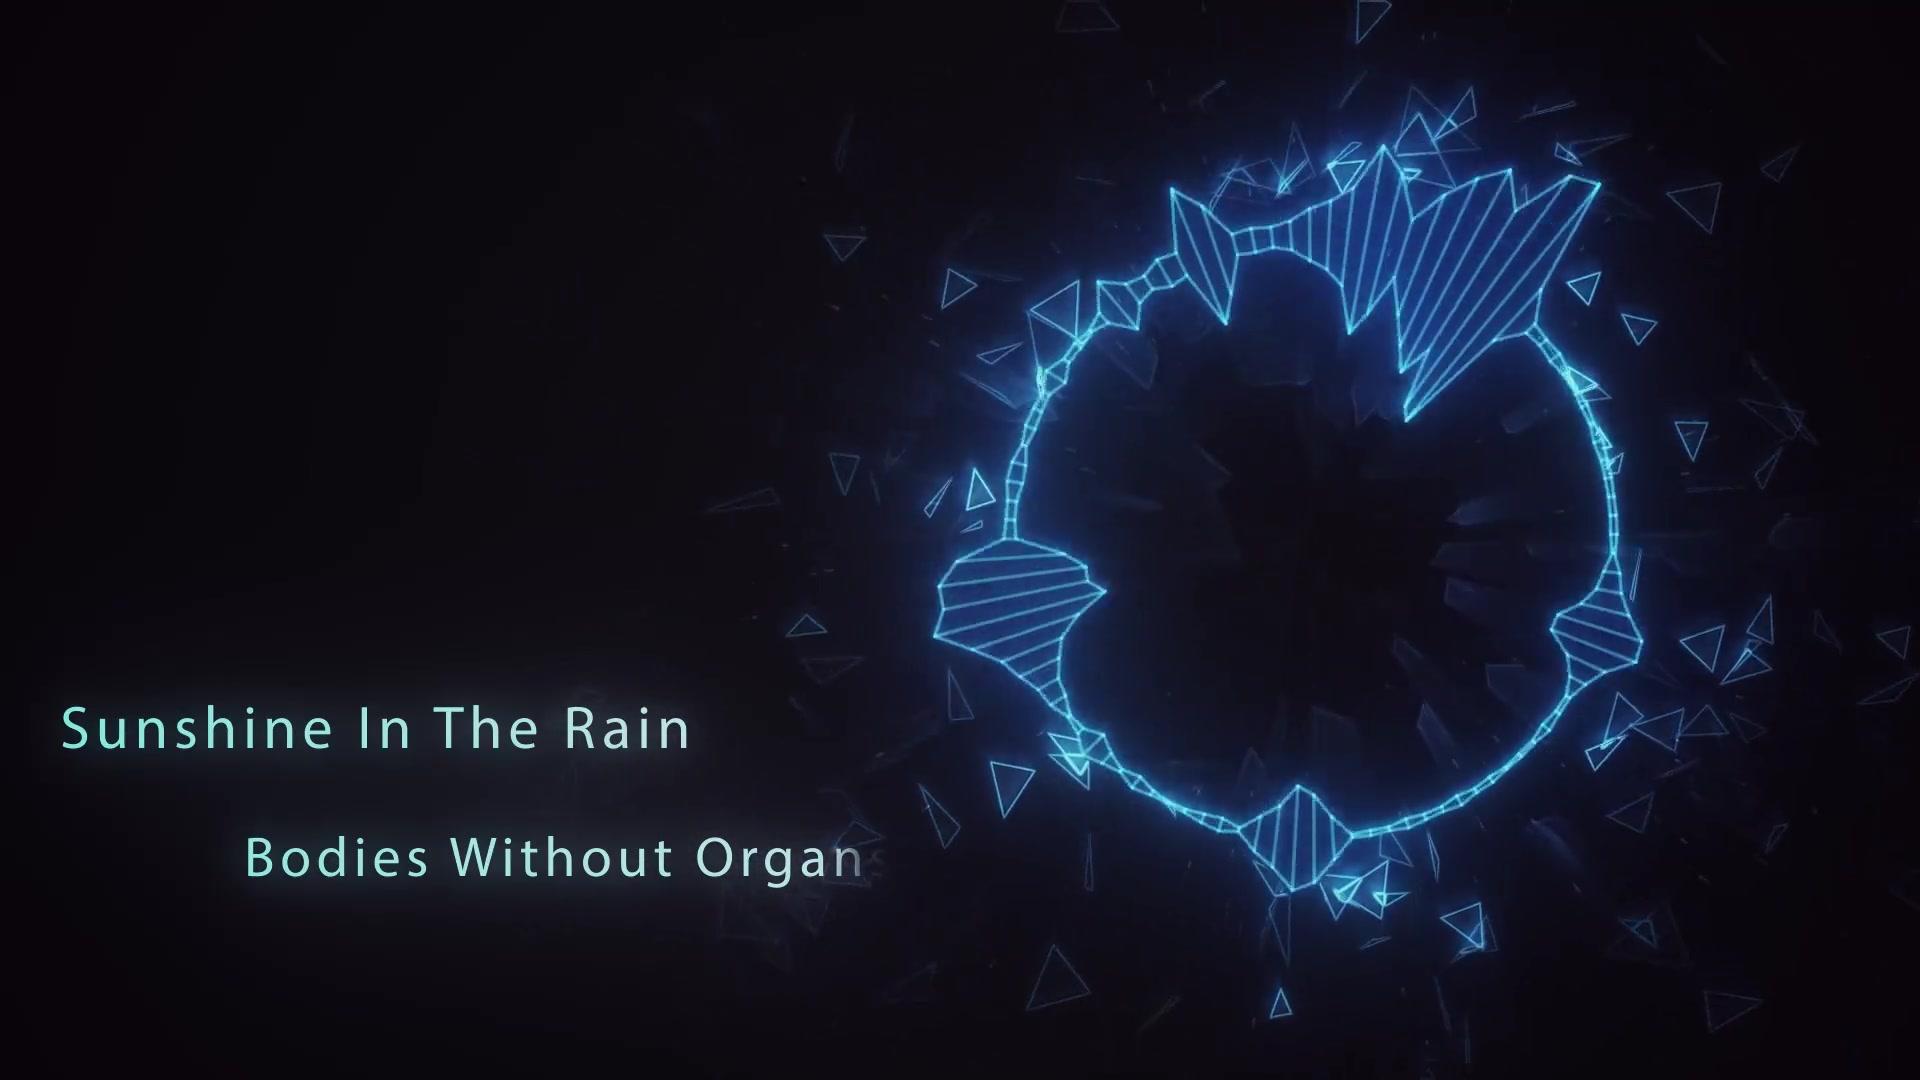 音乐:bodies without organs-sunshine in the rain  ( 日不落 英文版